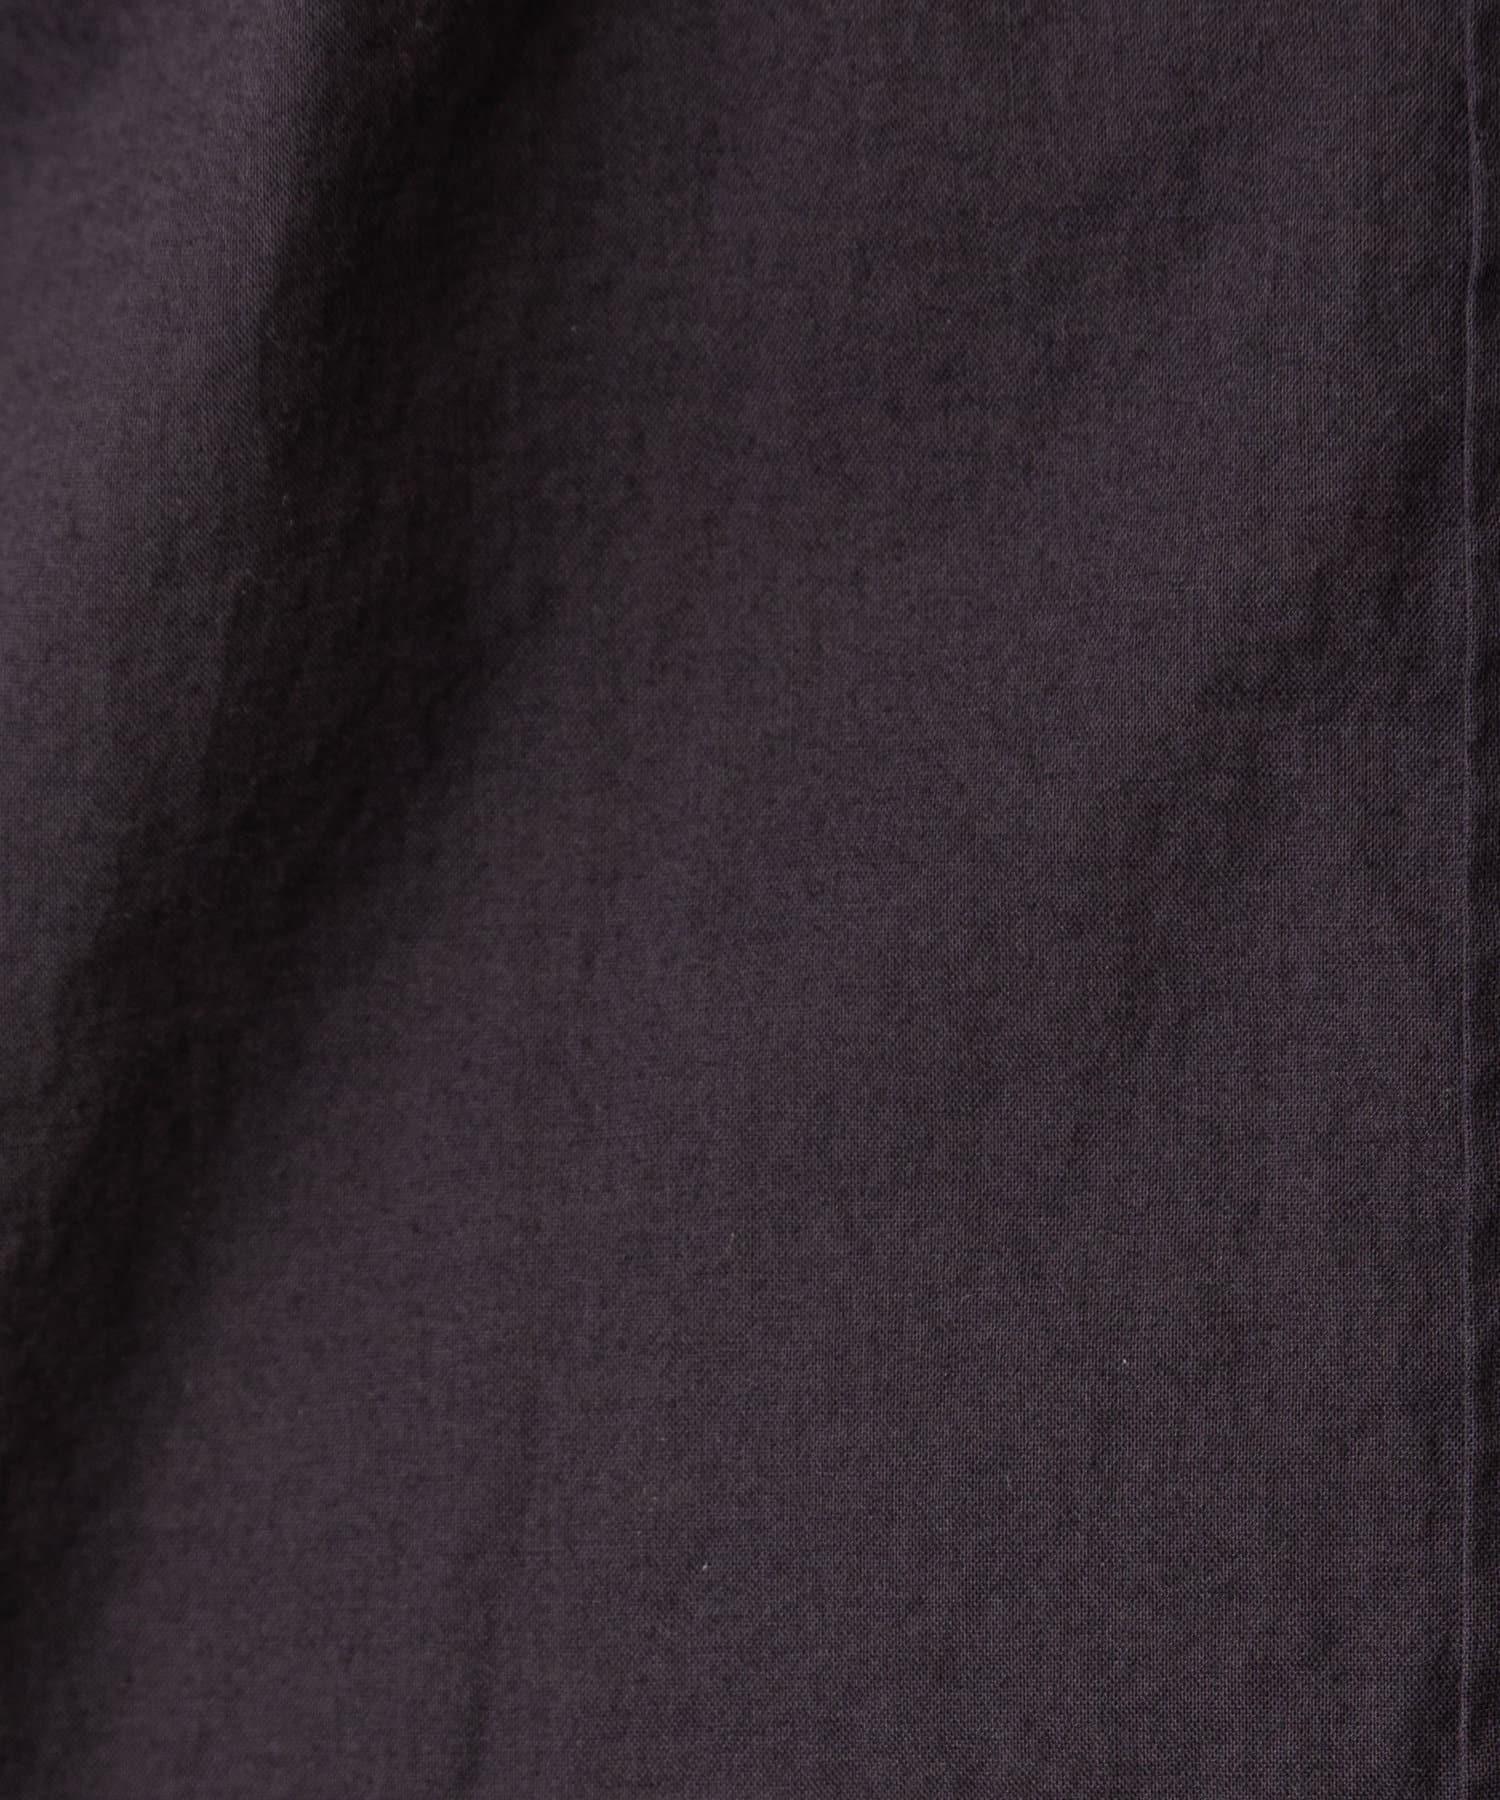 GALLARDAGALANTE(ガリャルダガランテ) バックボタンシアーシャツ